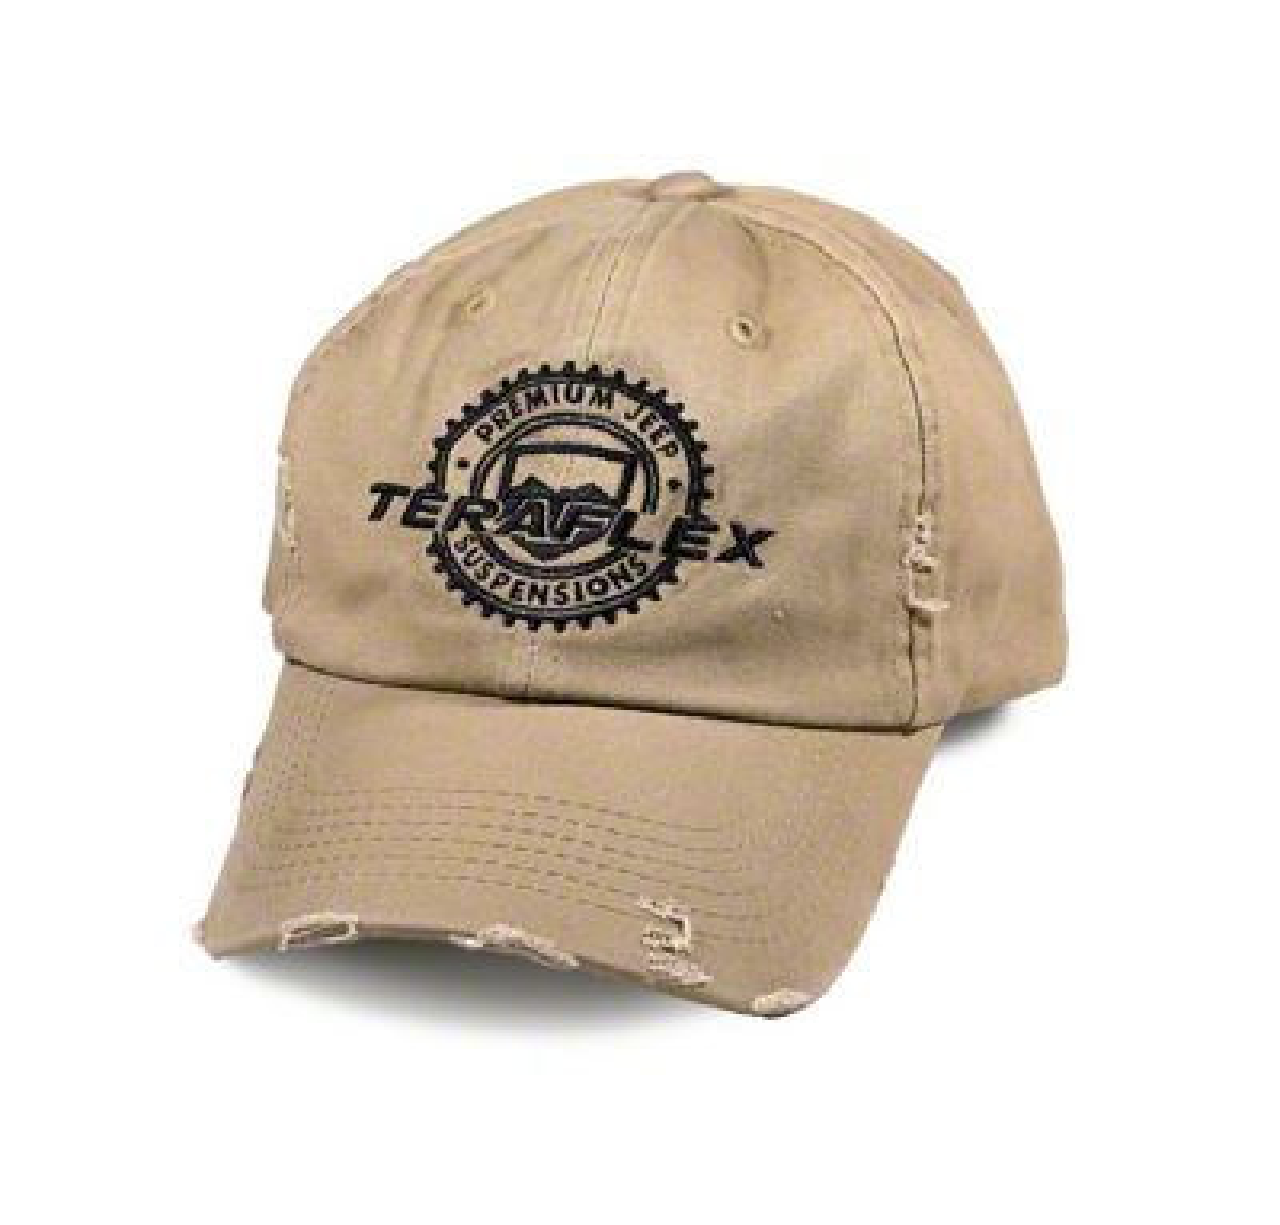 Teraflex Vintage Distressed Hat - Tan